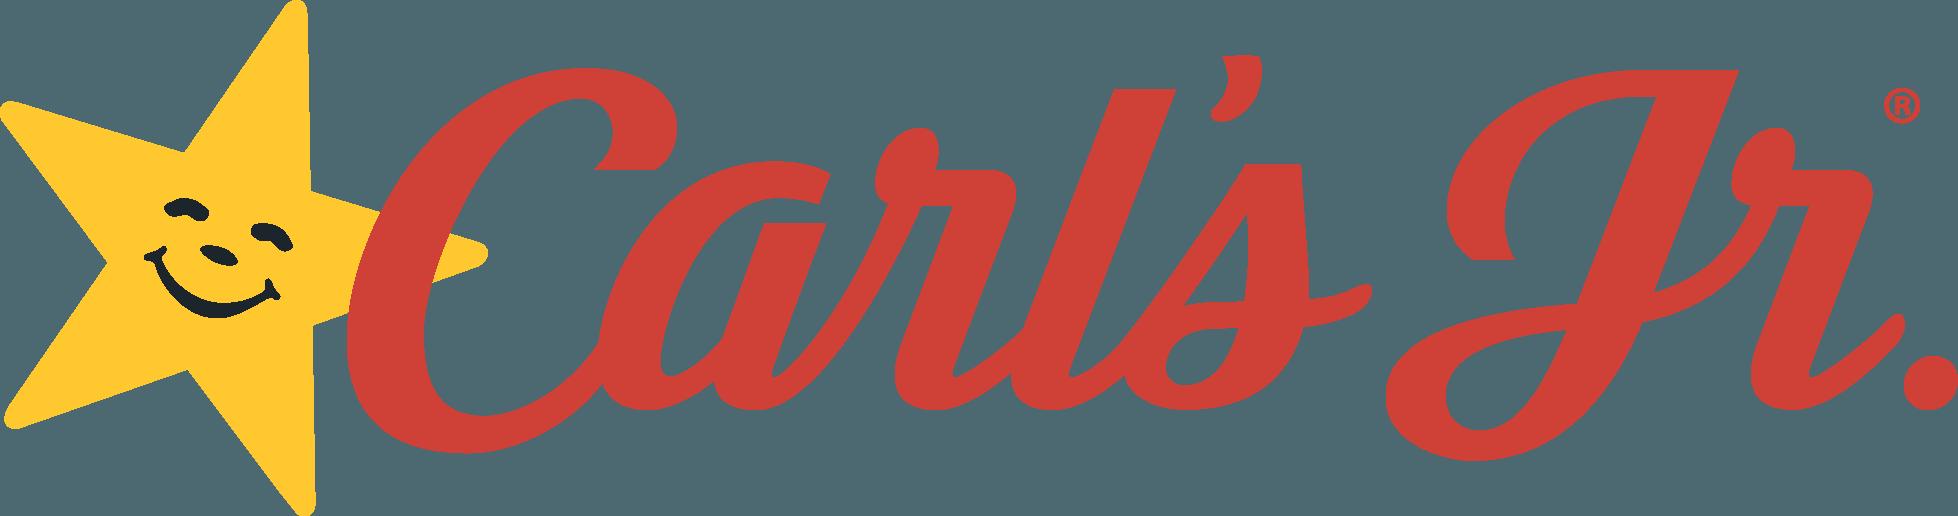 Carls Jr Logo png